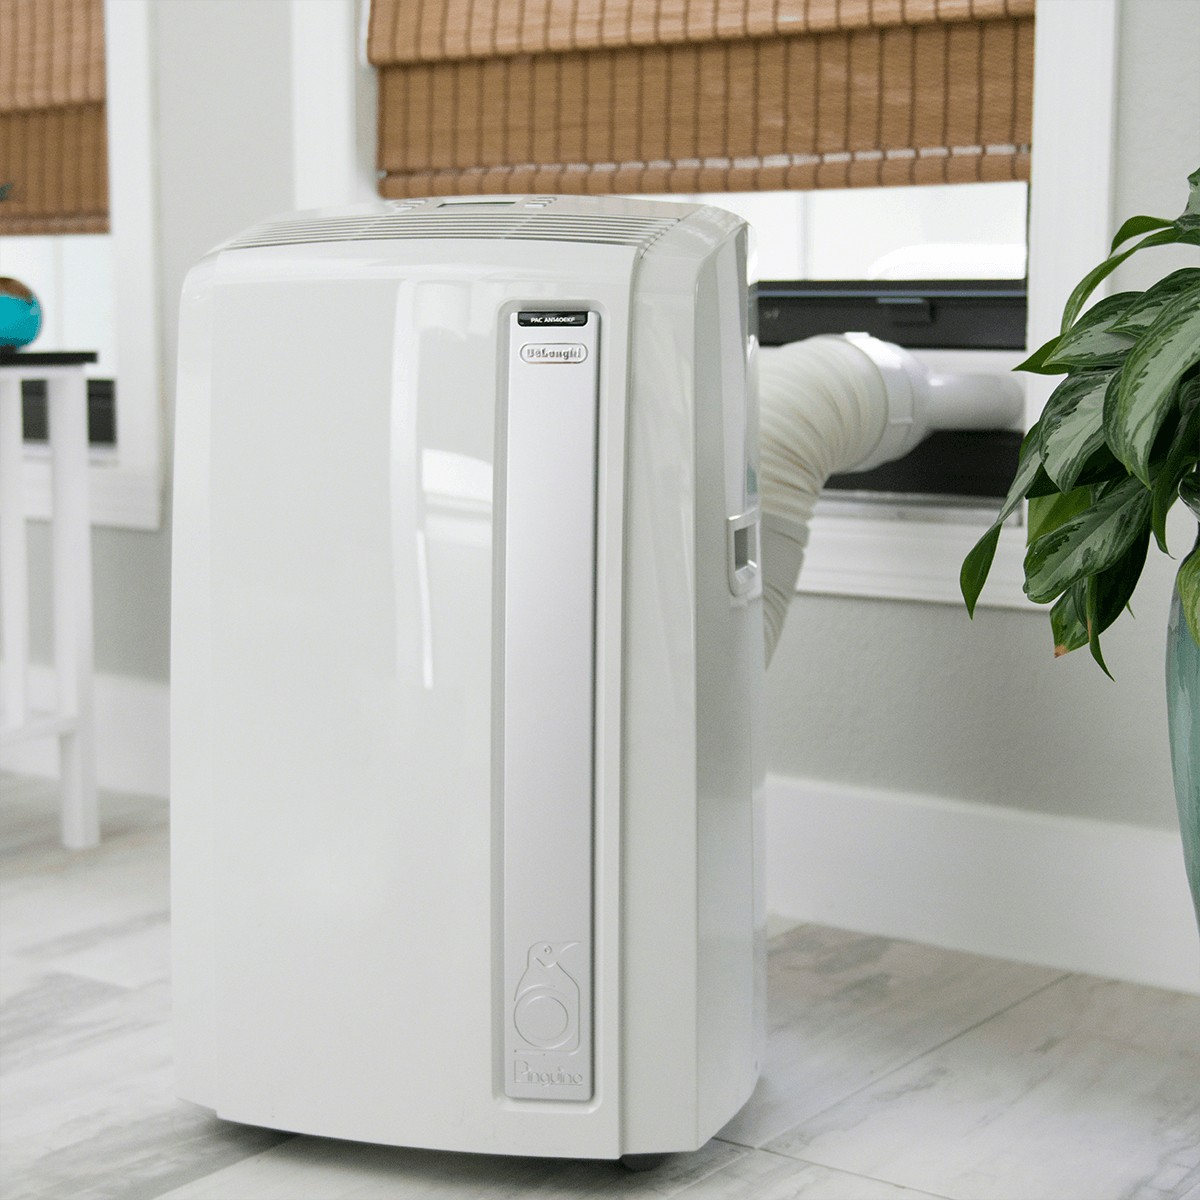 DeLonghi Pinguino PAC - Top Portable Air Conditioners